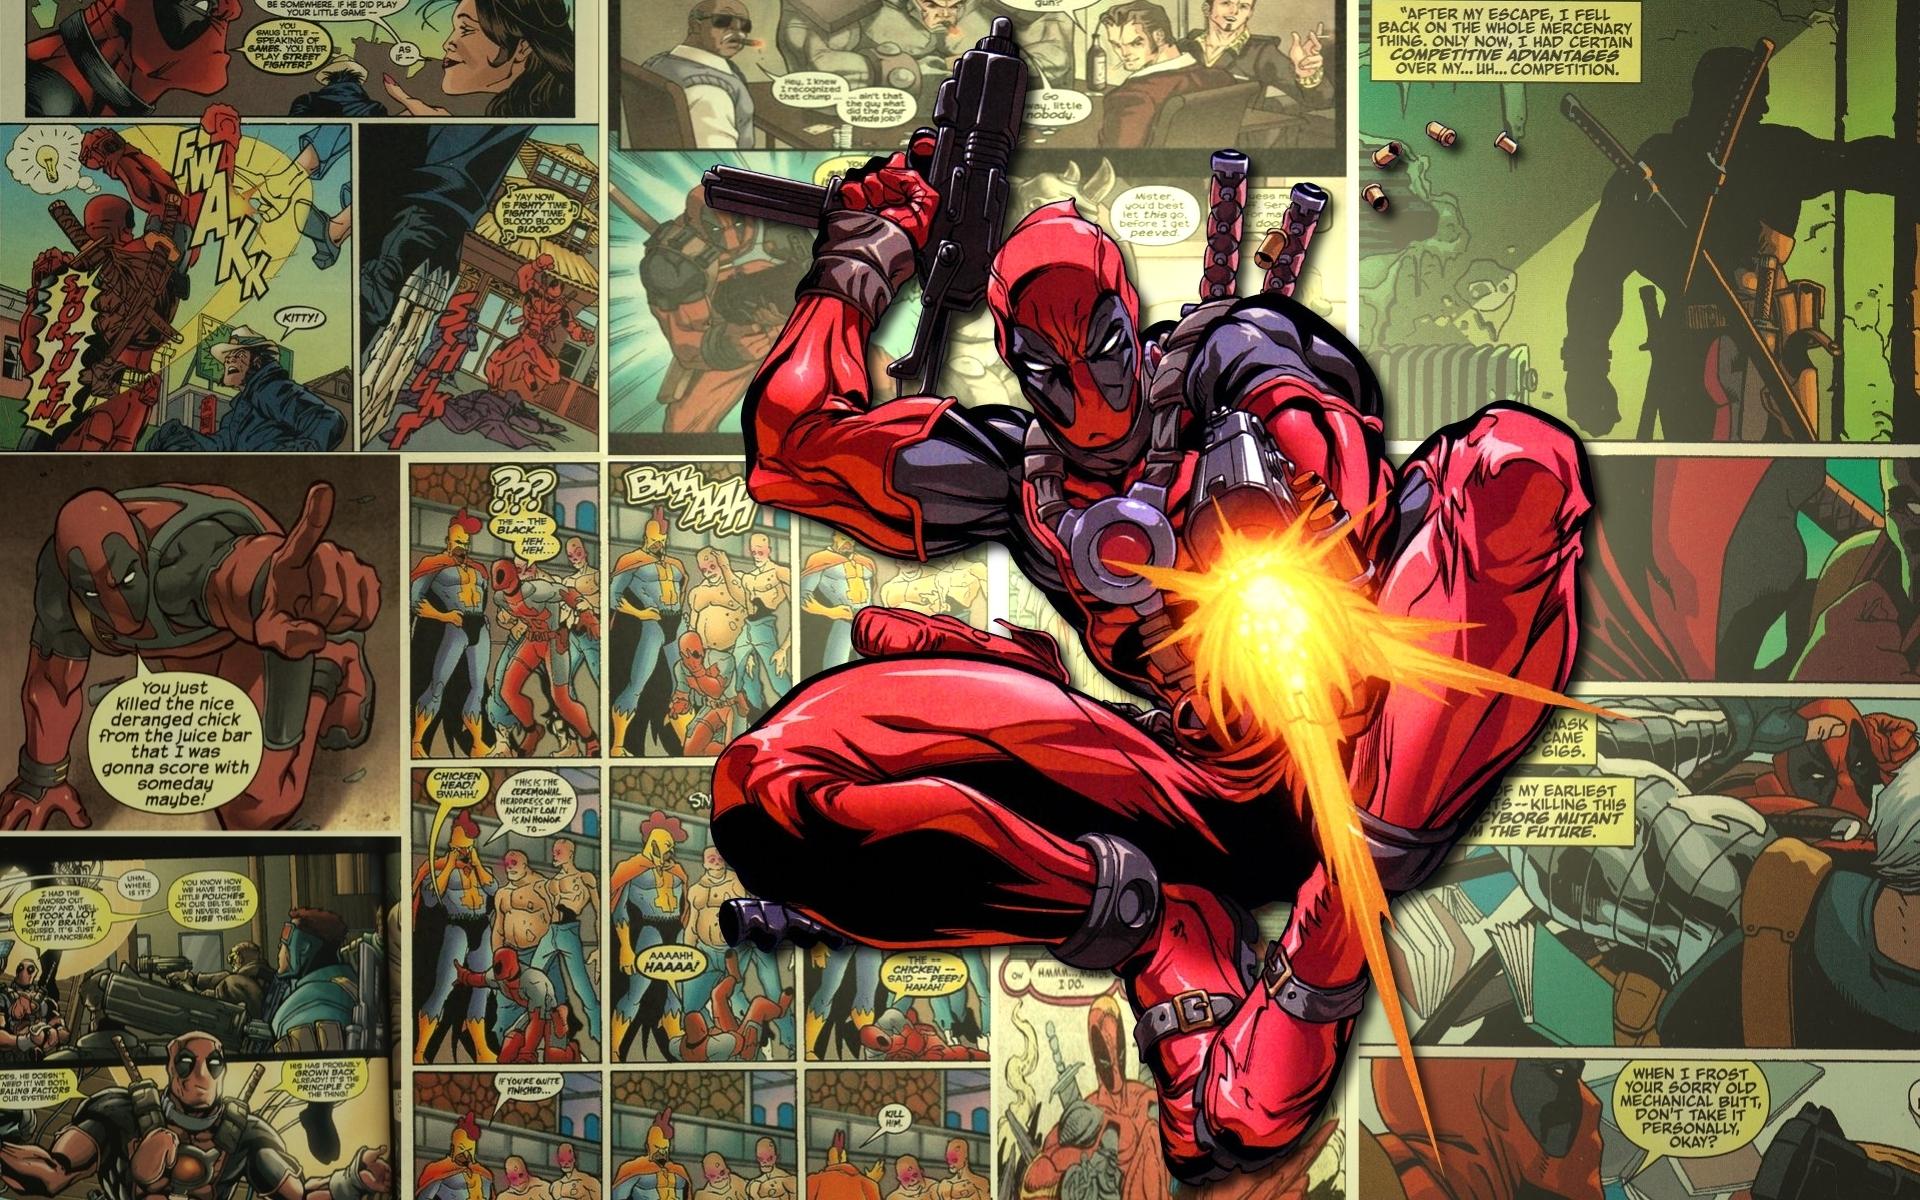 Deadpool Wallpaper 1920x1080 ImageBankbiz 1920x1200